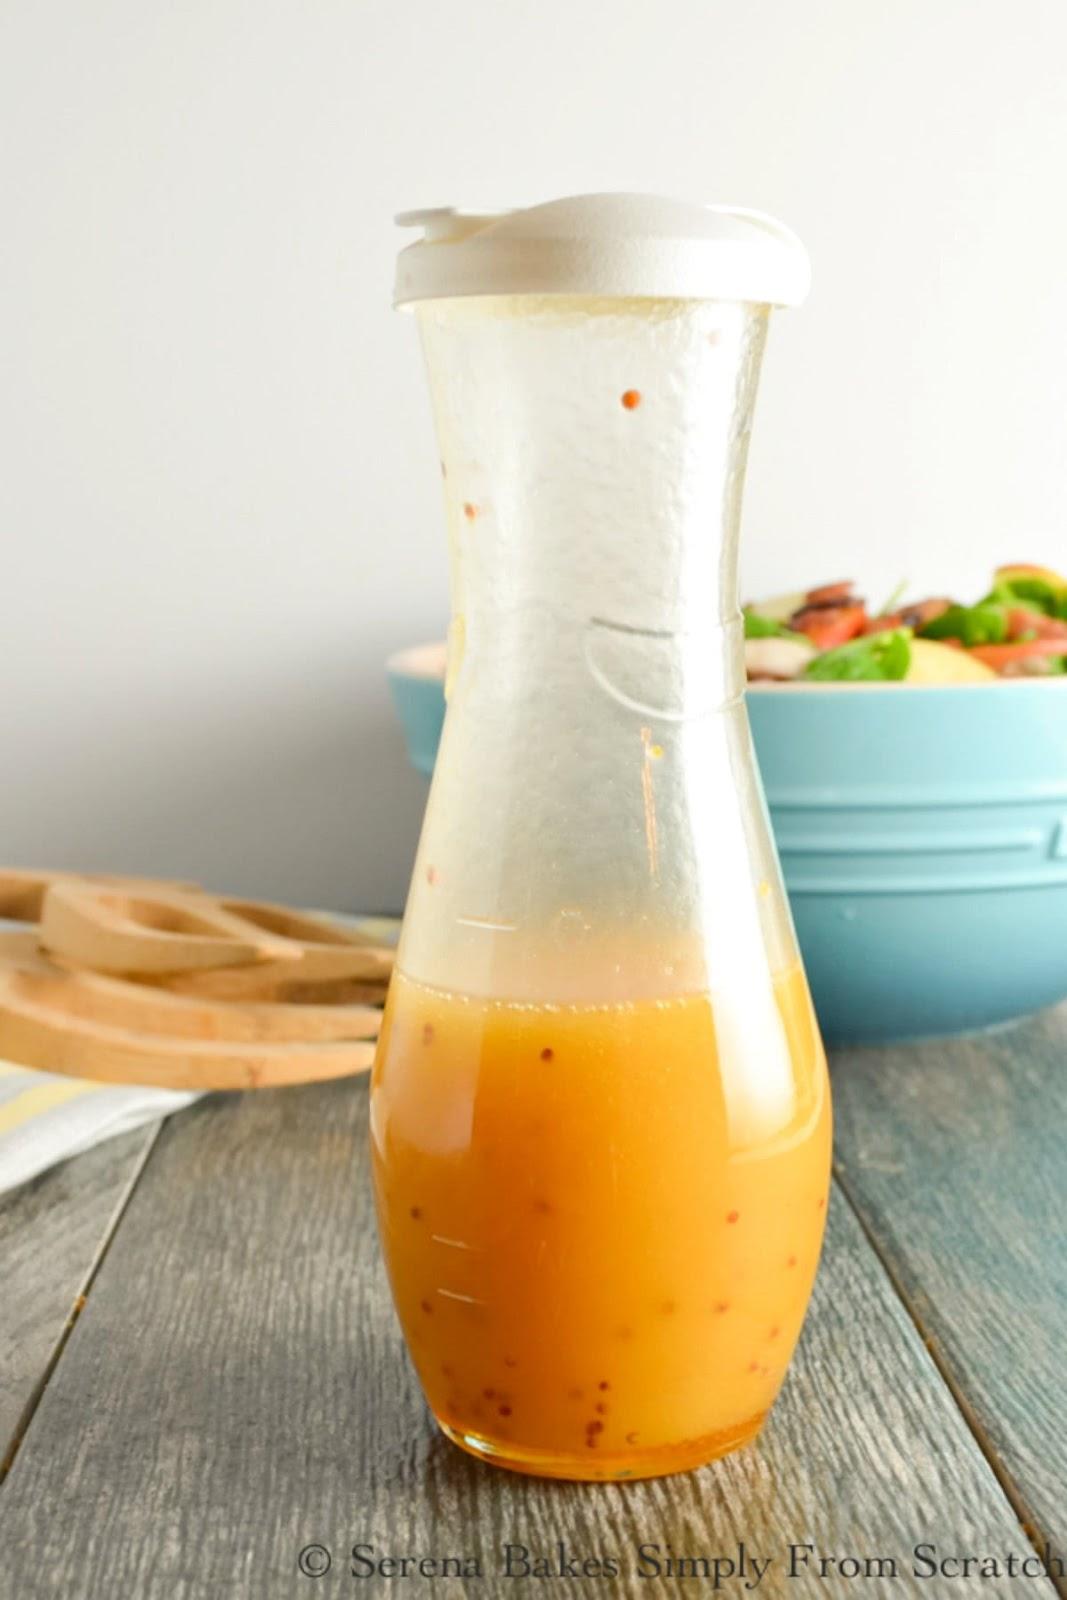 A shaker jar with Olive Oil, Apple Cider Vinegar, Mustard, Honey, and Salt for Honey Mustard Dressing.